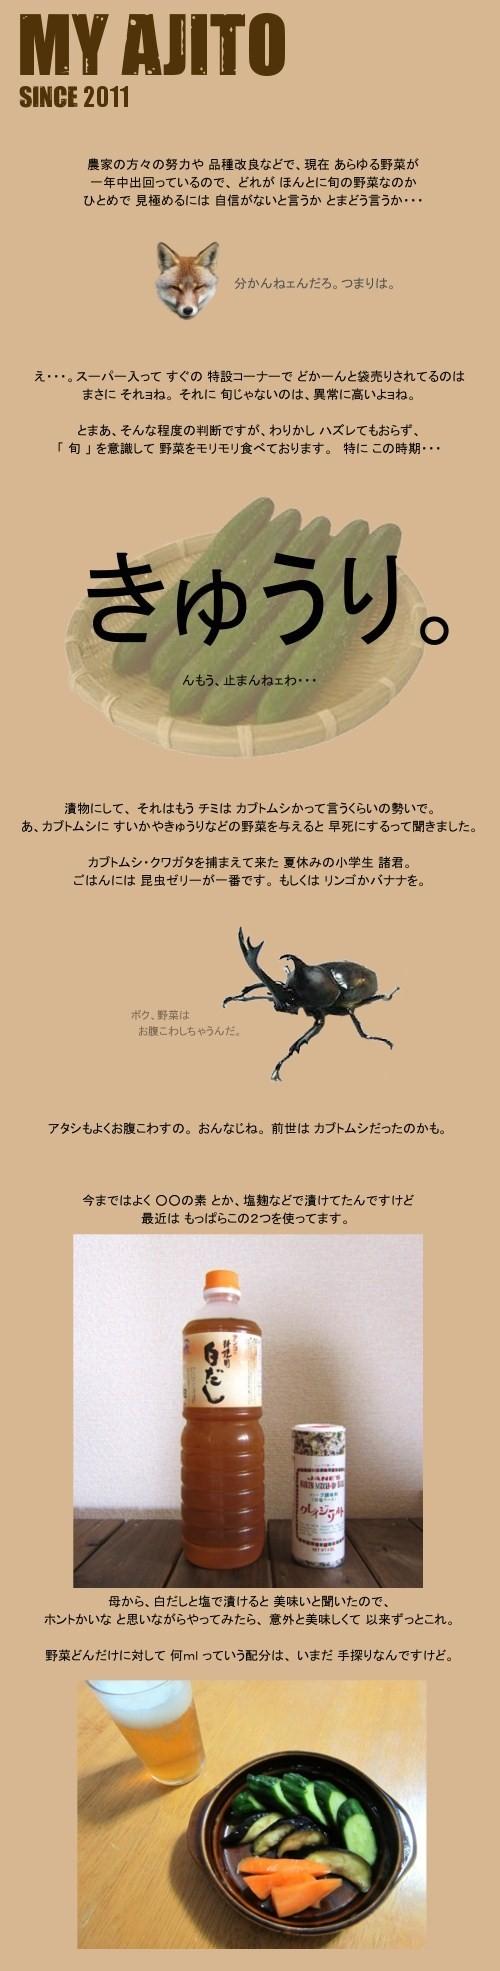 tsuke_01.jpg